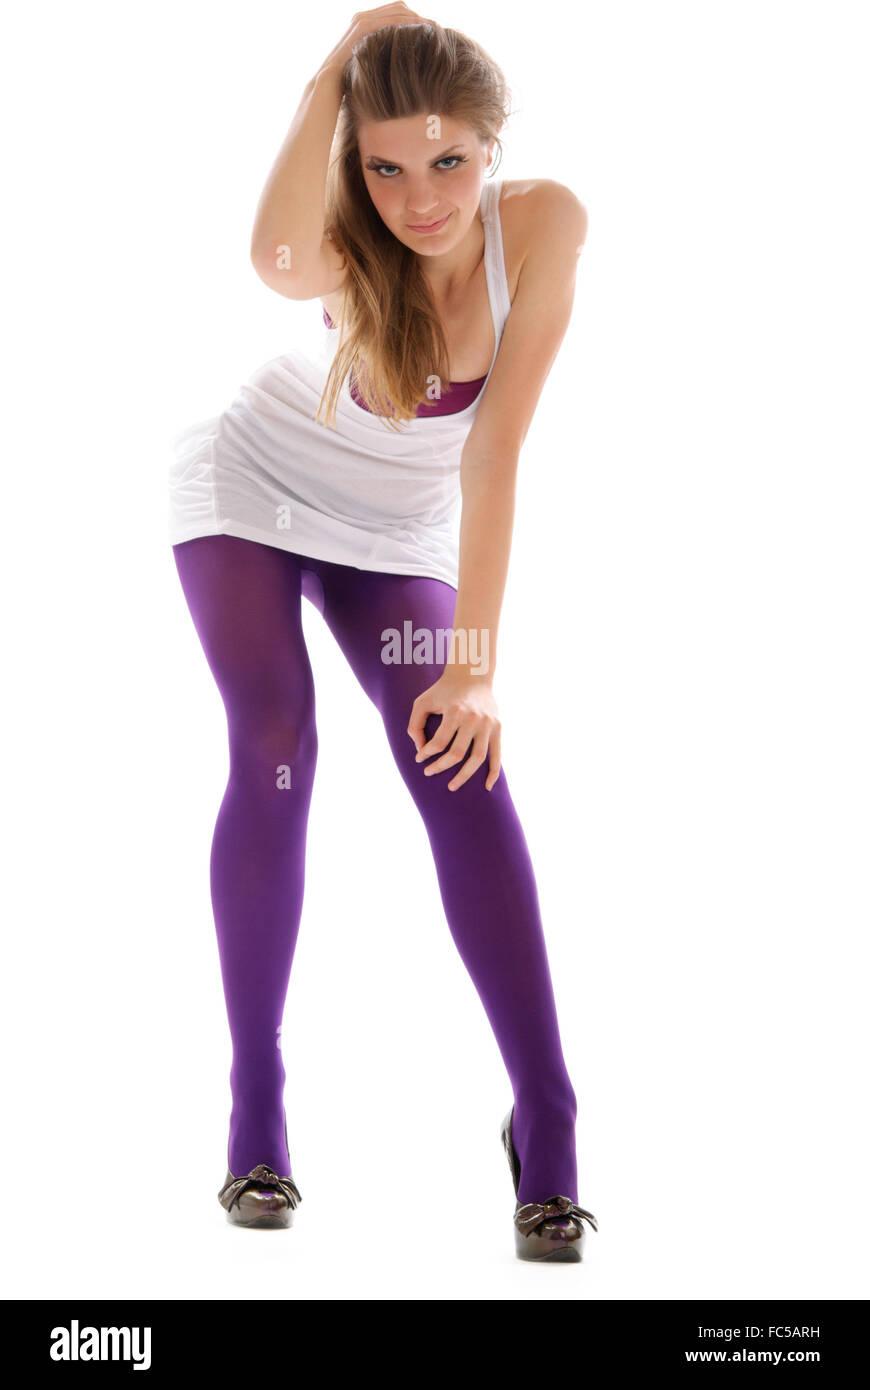 a930fc82c6b93 Panty Hose Stock Photos & Panty Hose Stock Images - Page 2 - Alamy